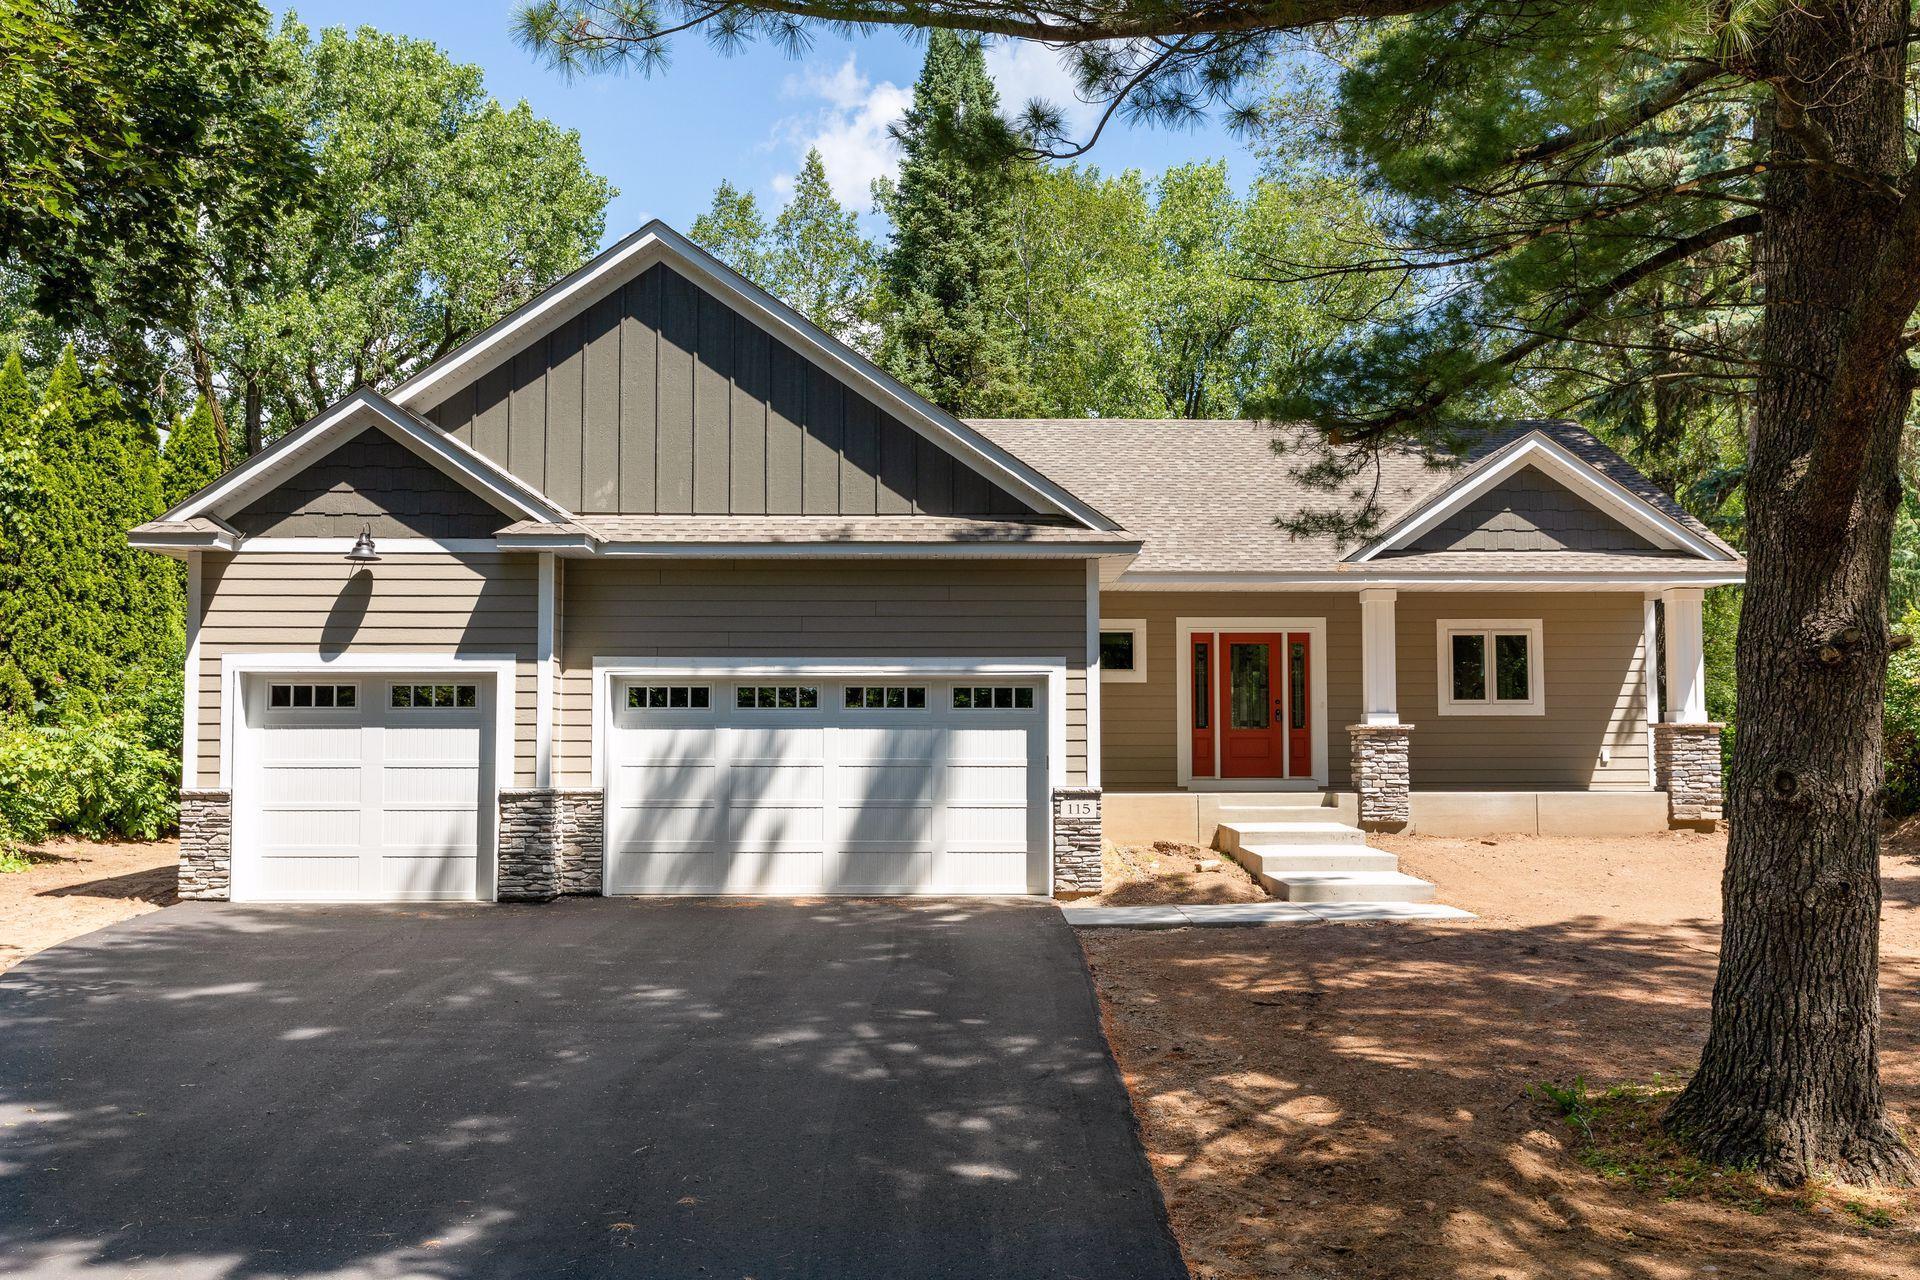 115 Greenwood Property Photo - Mahtomedi, MN real estate listing